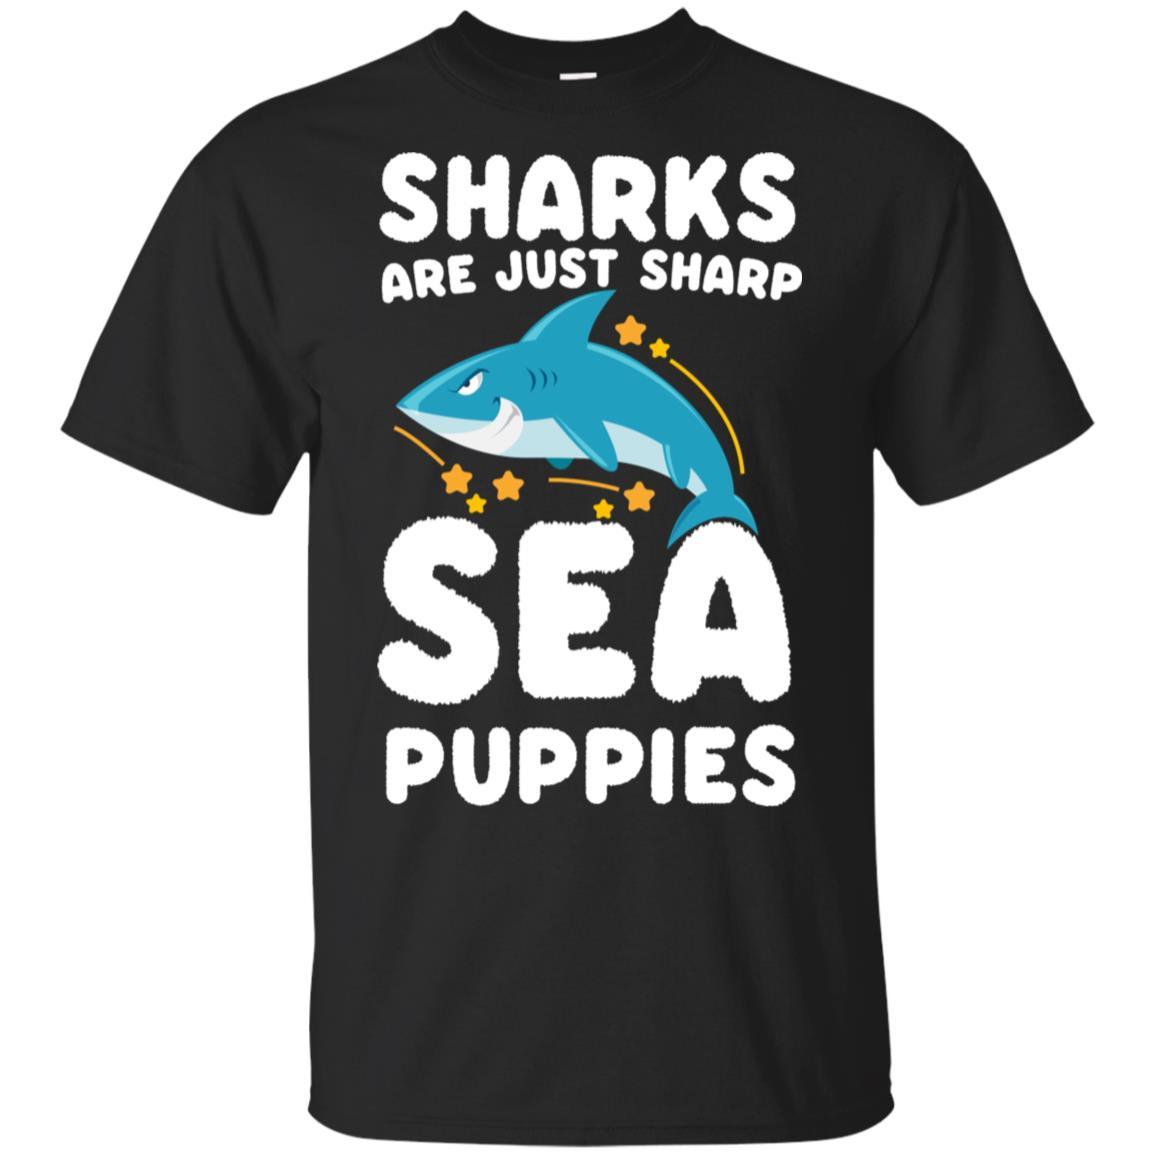 Sharks Are Just Sea Puppies Funny Marine Unisex Short Sleeve